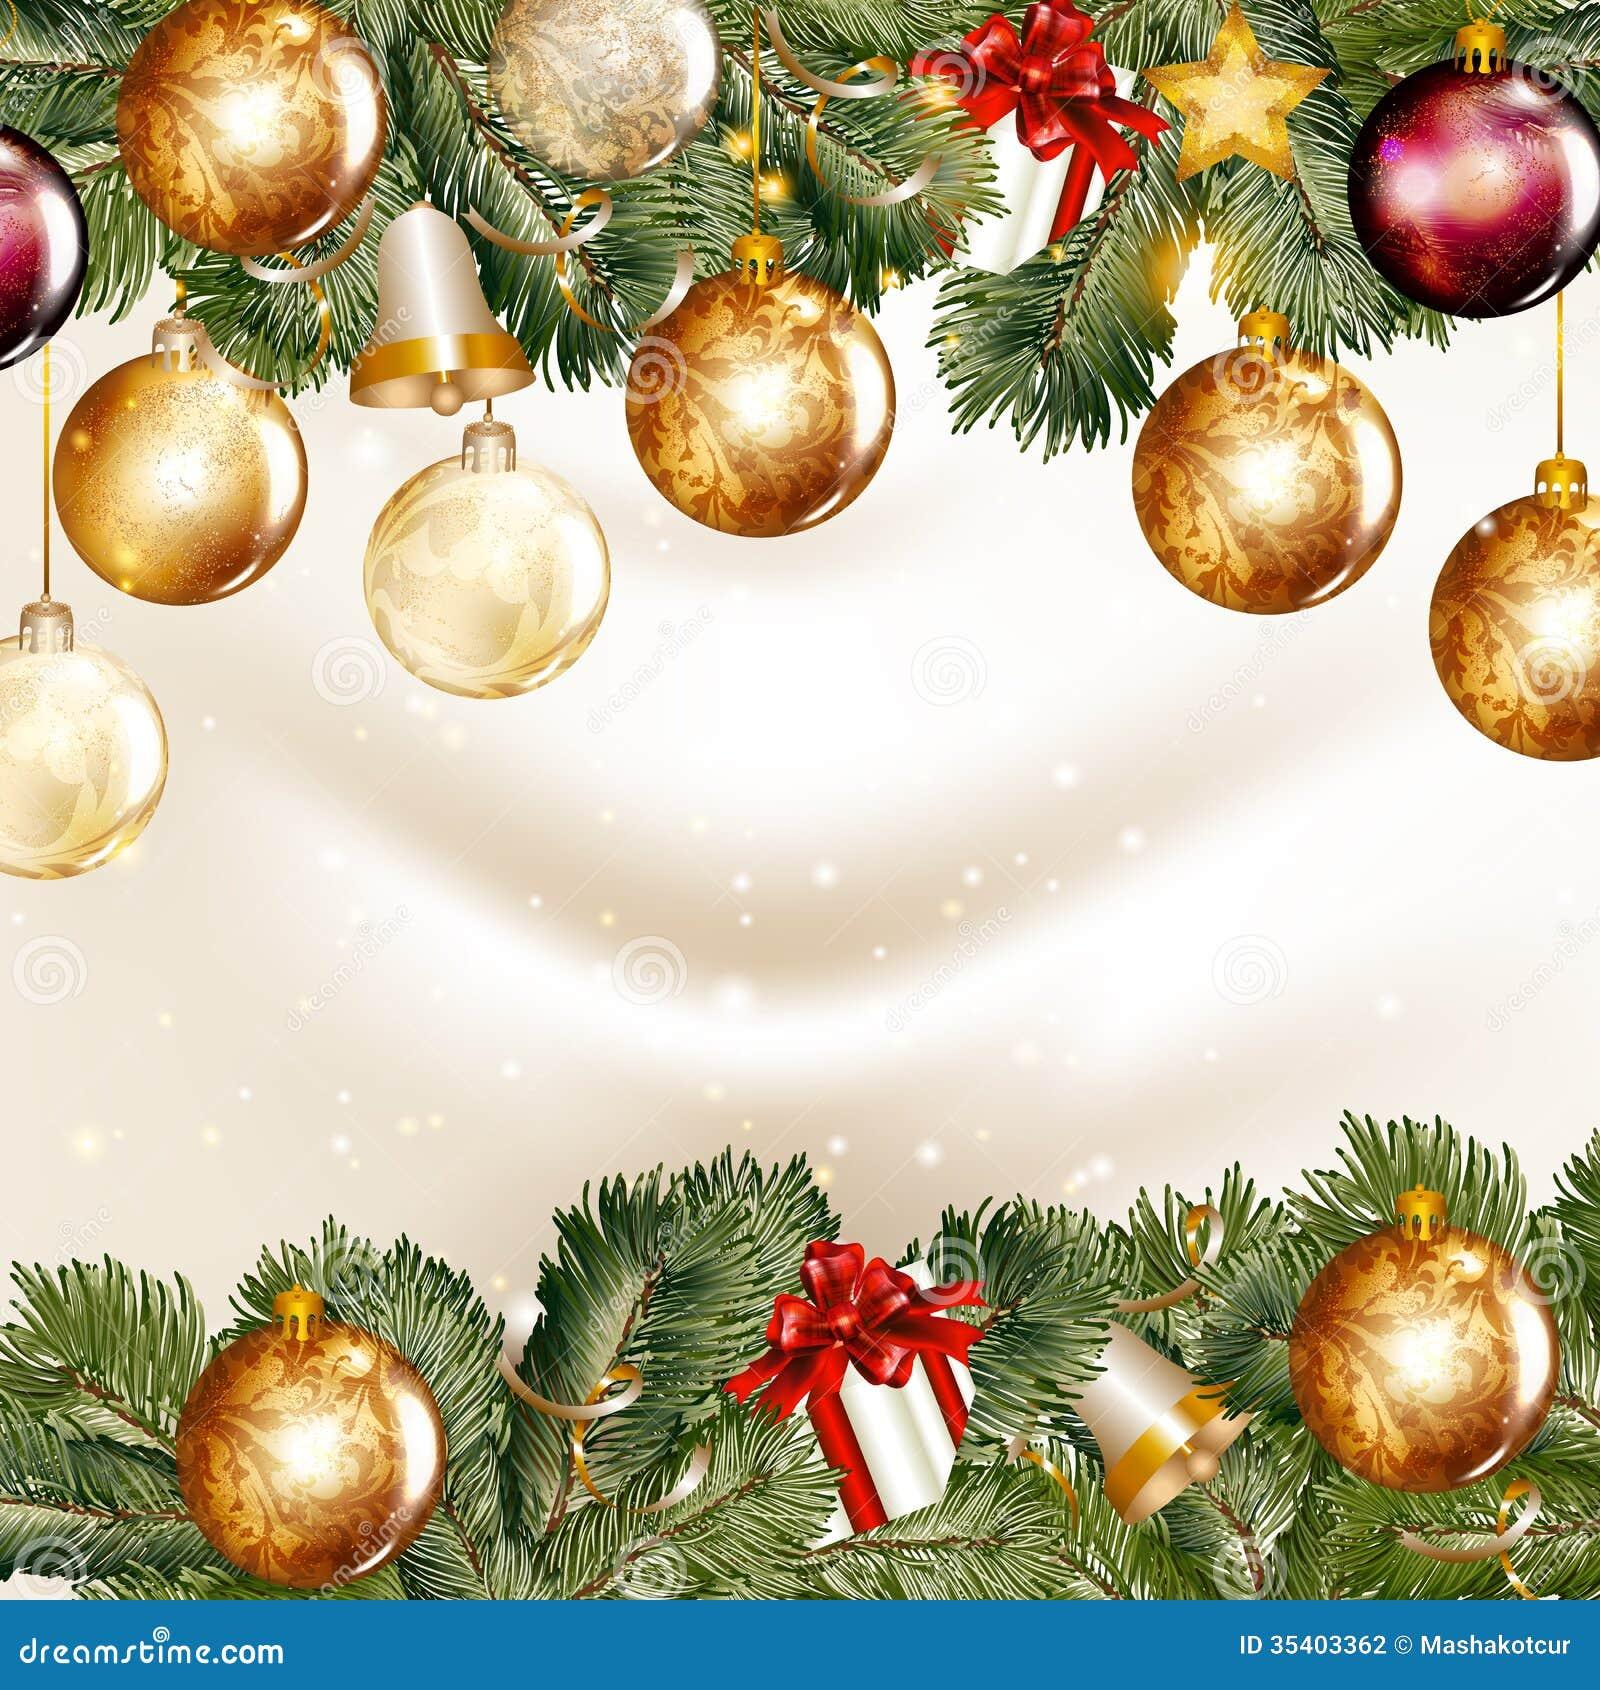 White Decorative Christmas Tree